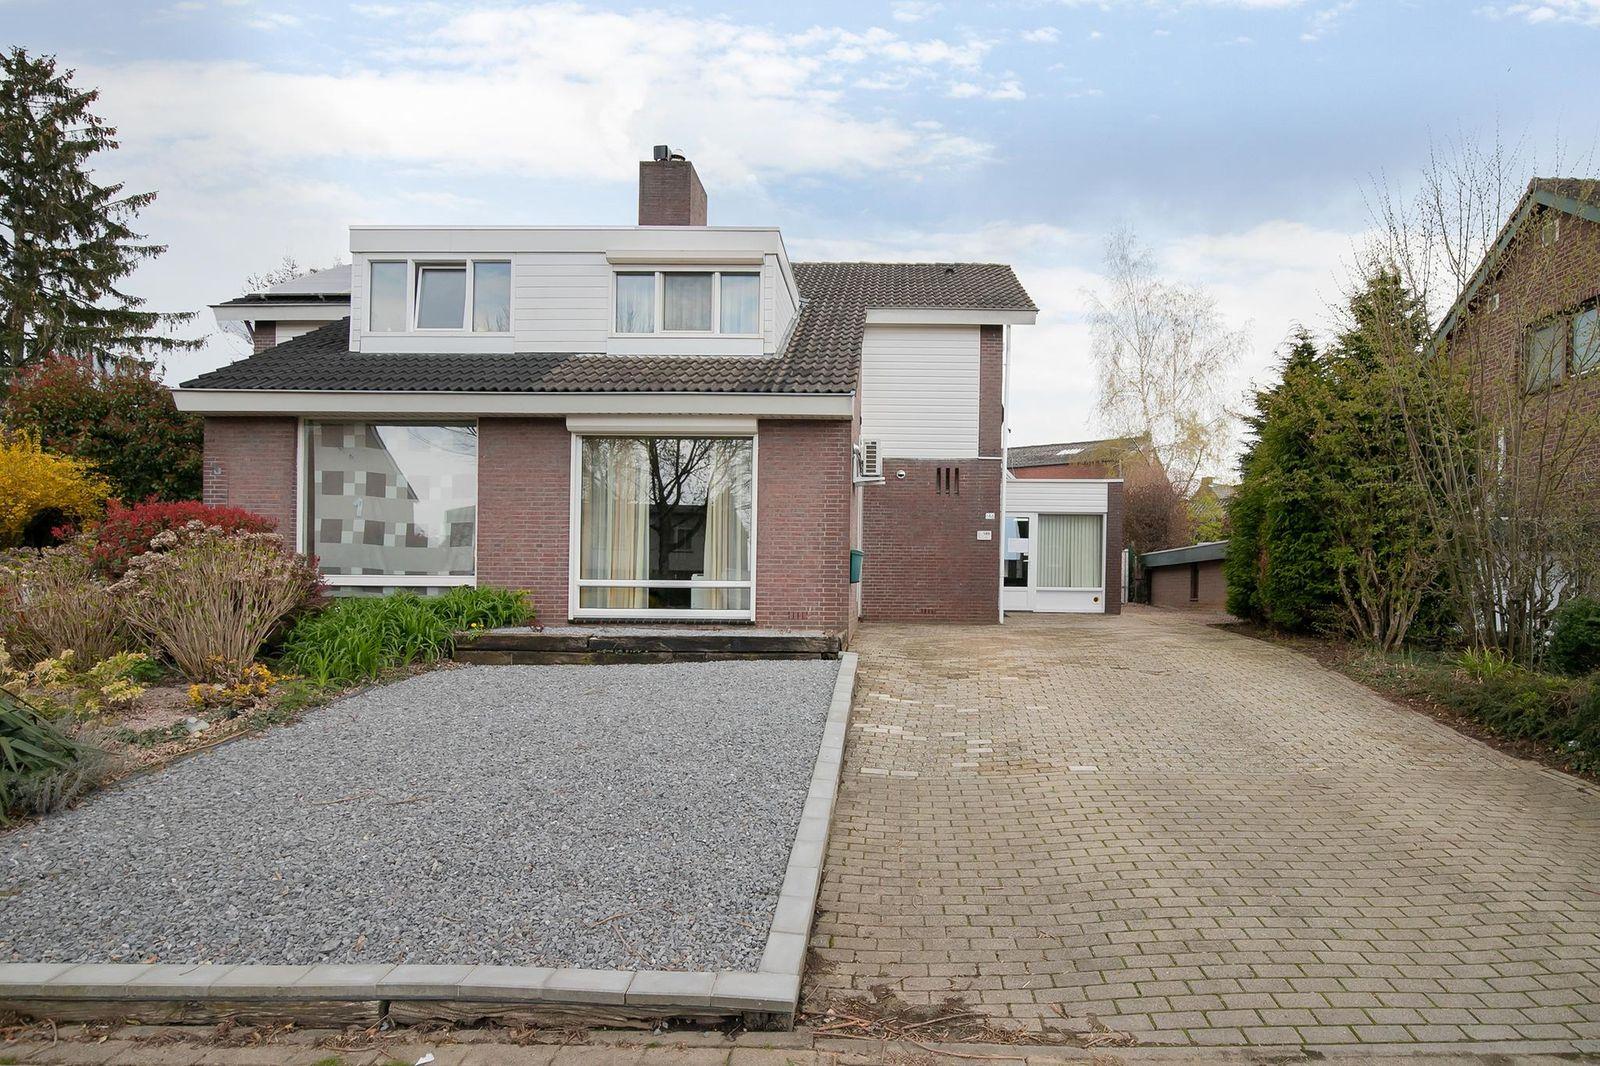 Leyenbroekerweg 146, Sittard